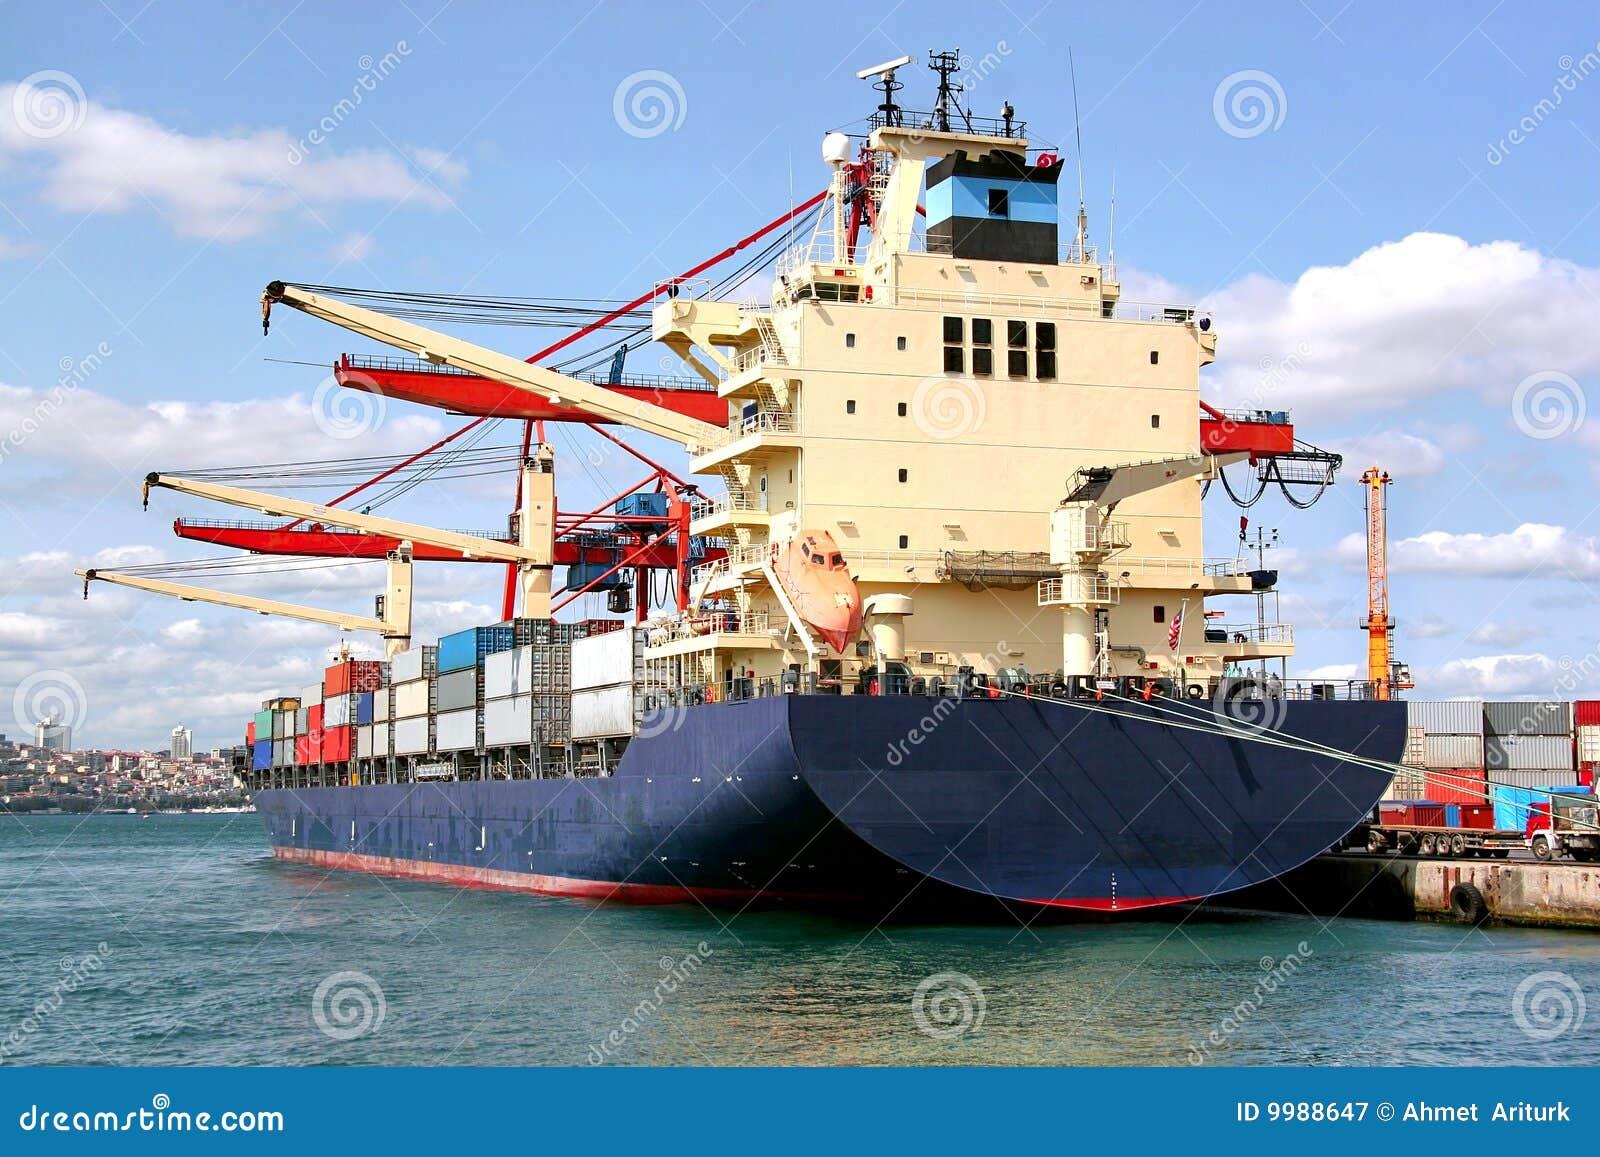 Modern cargo ship